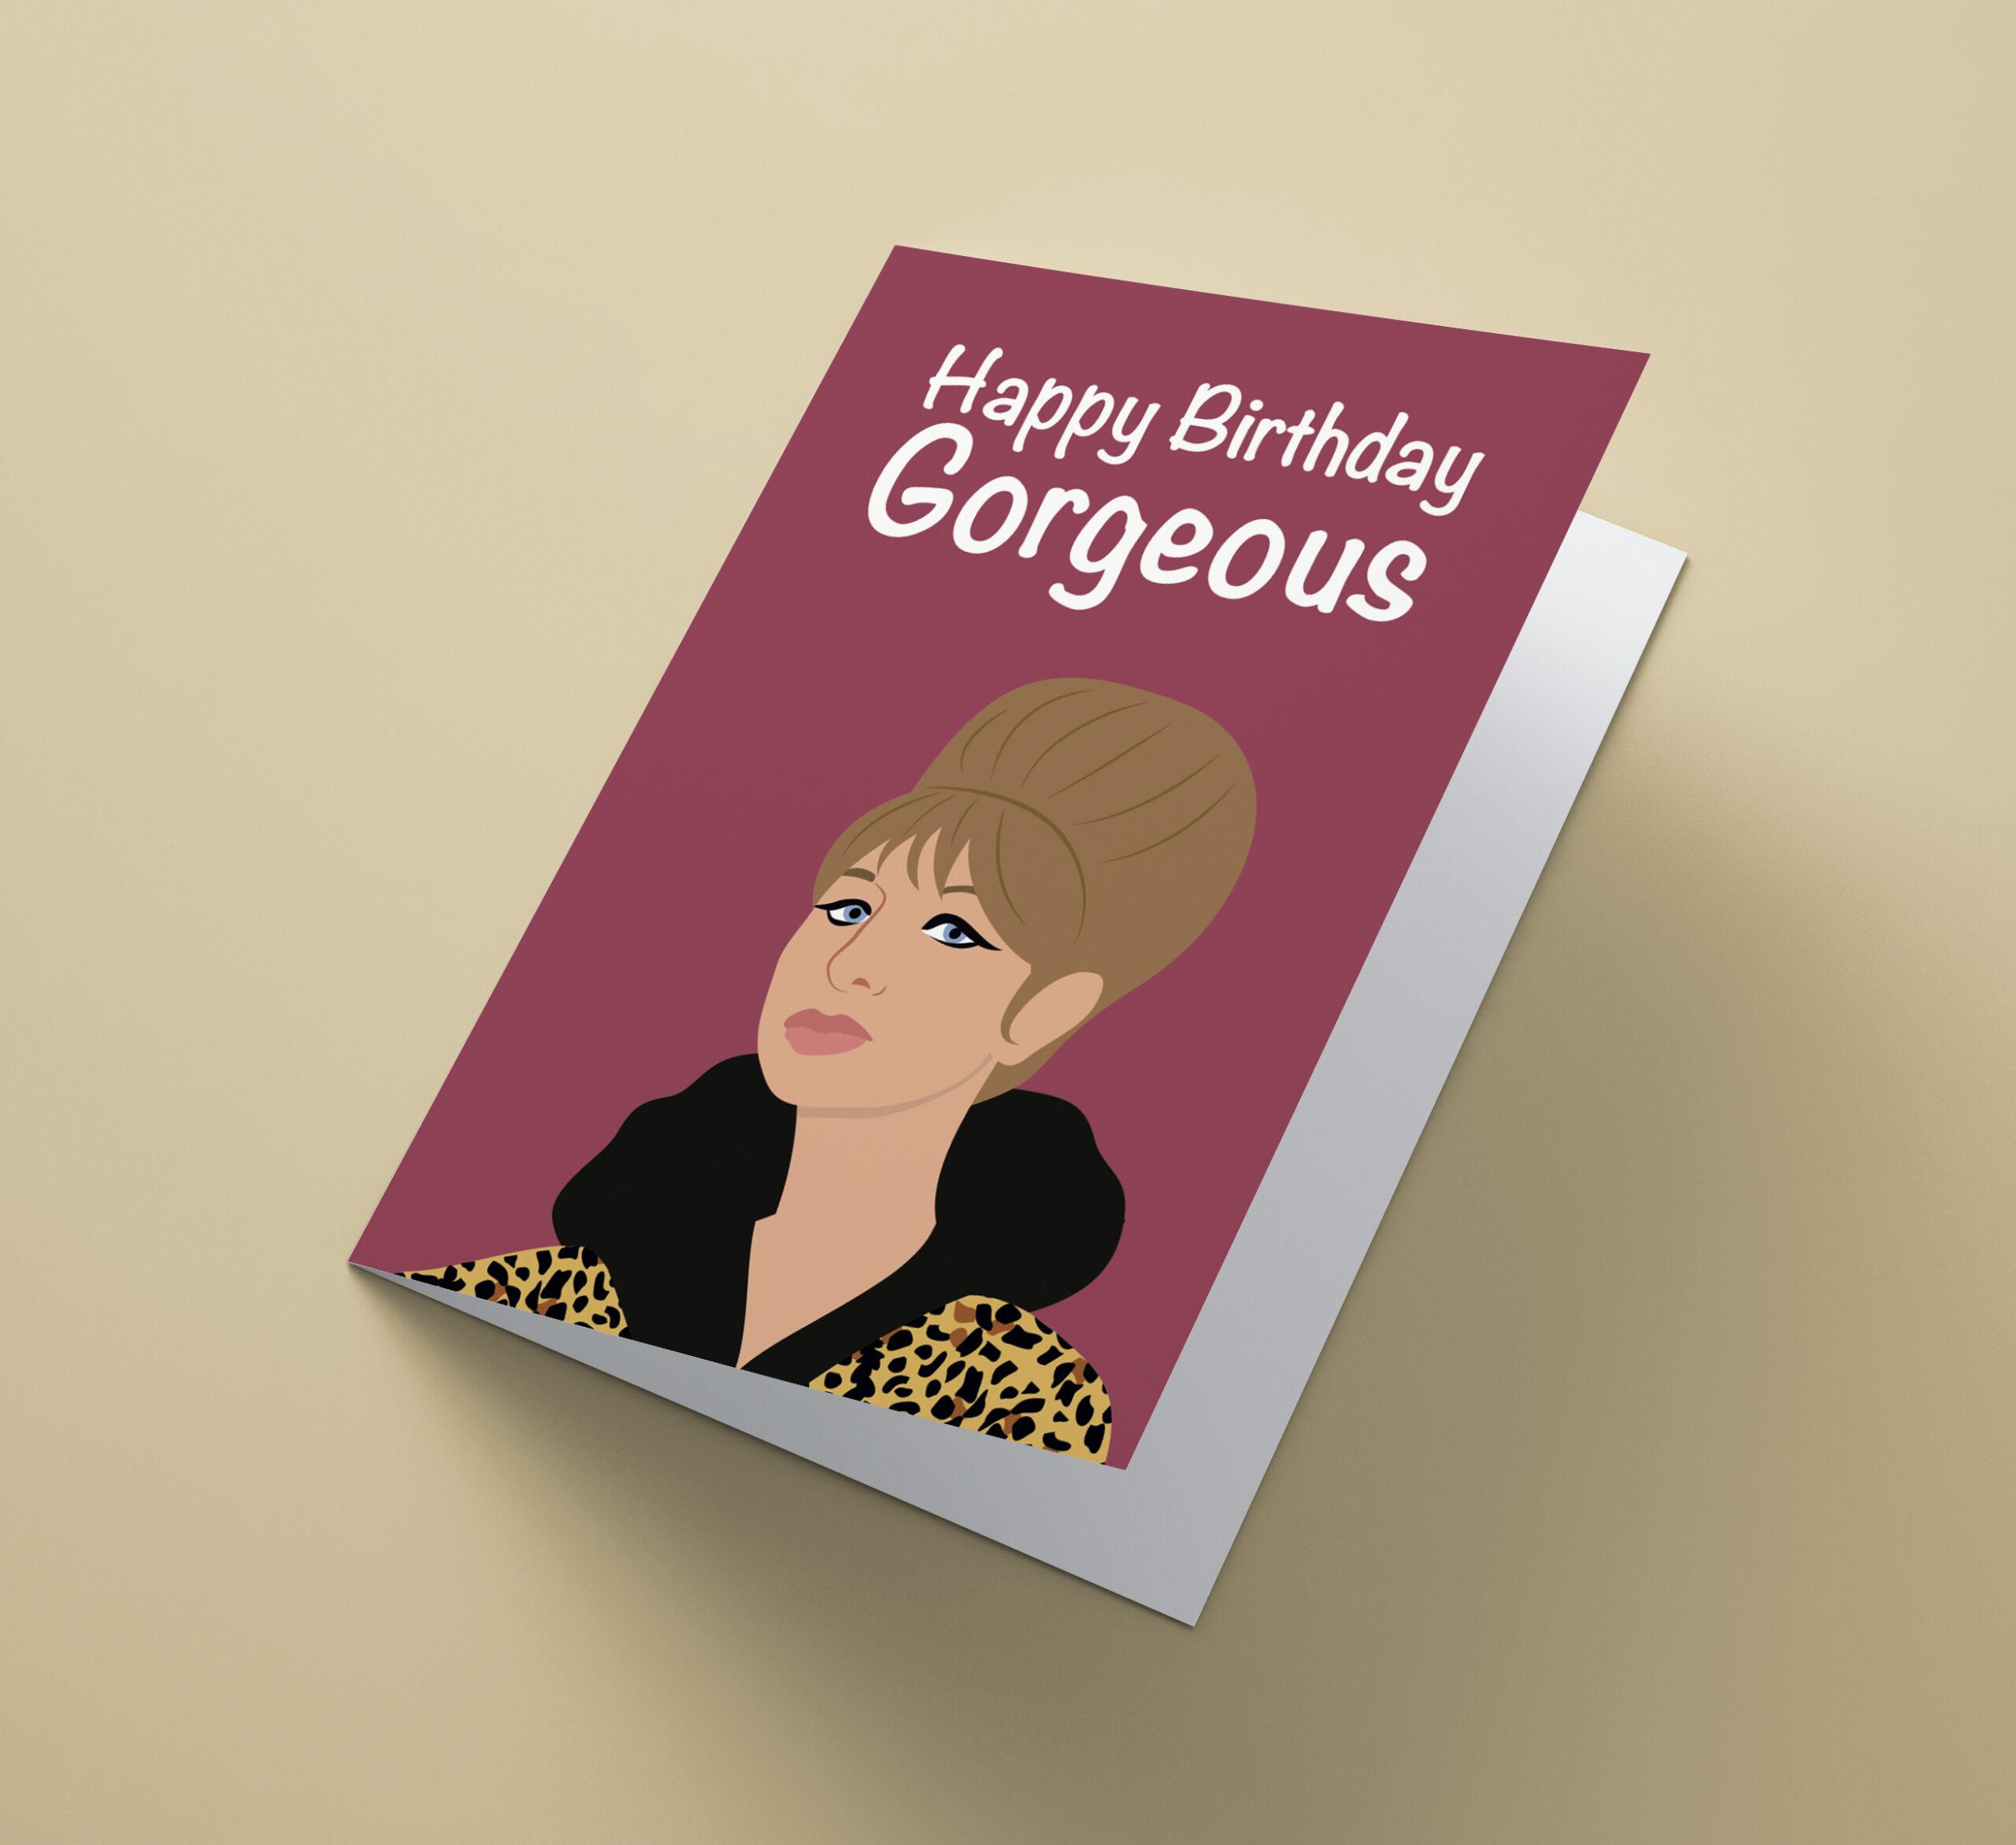 Happy Birthday Gorgeous - Barbra Streisand